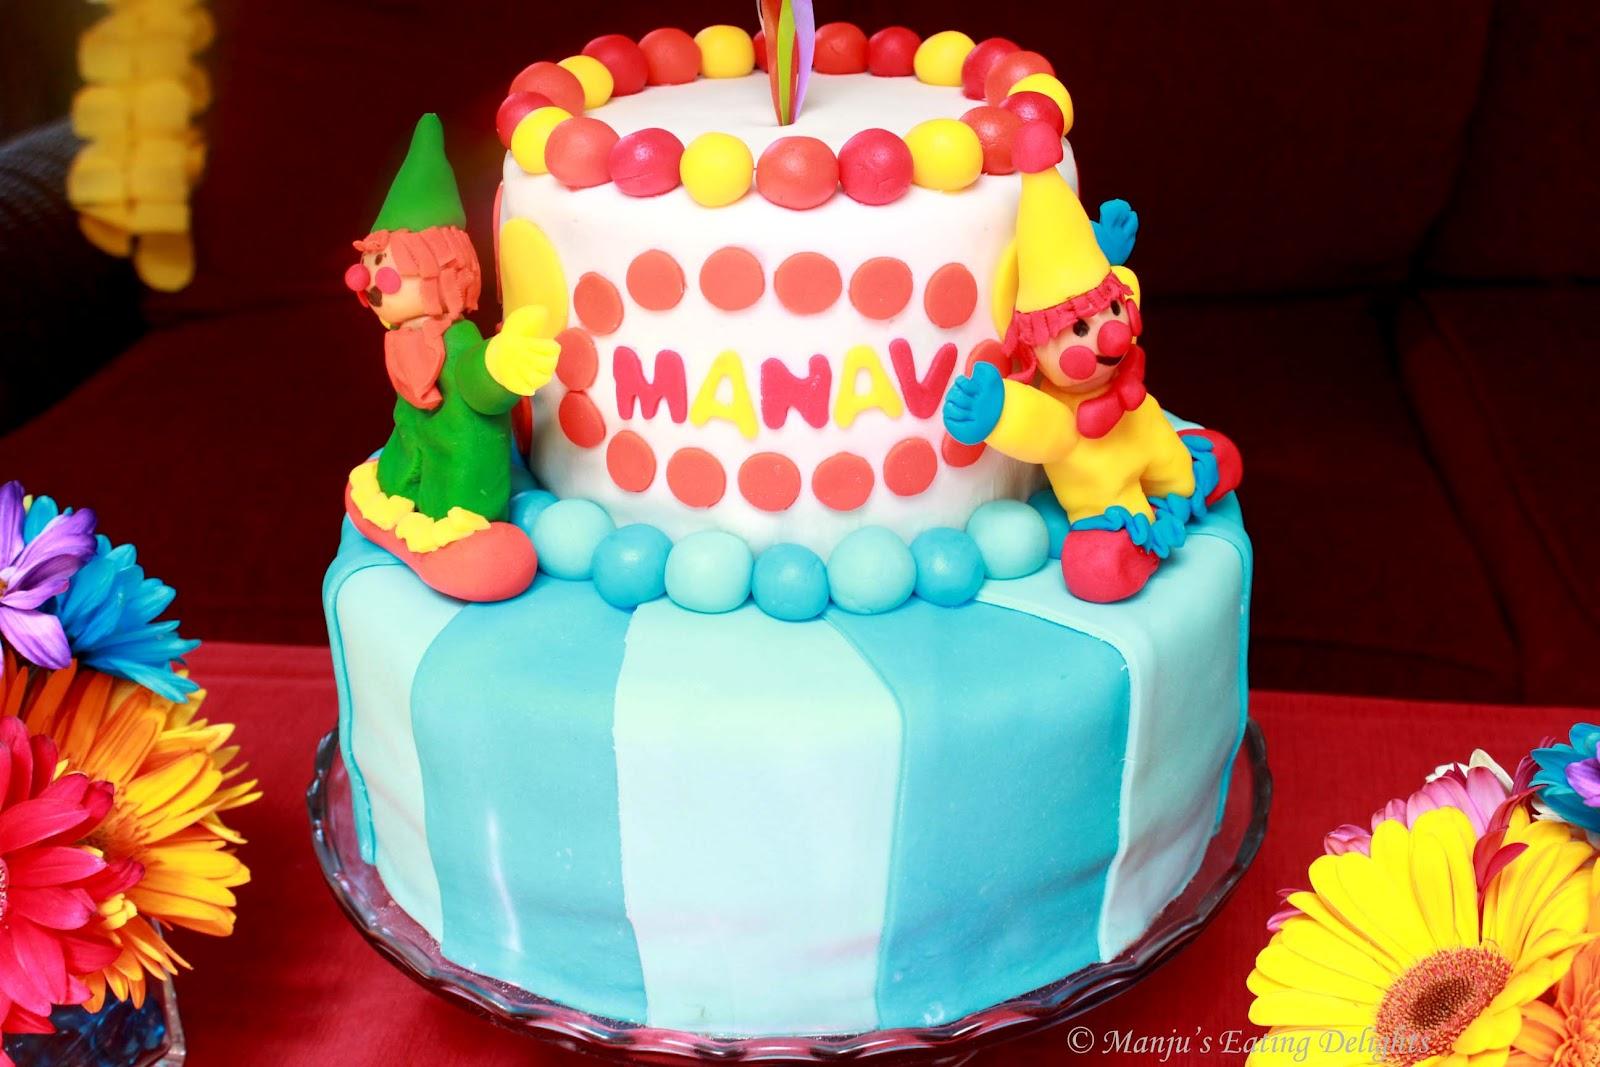 Manjus Eating Delights A Rainbow Birthday Partynav Turns 1